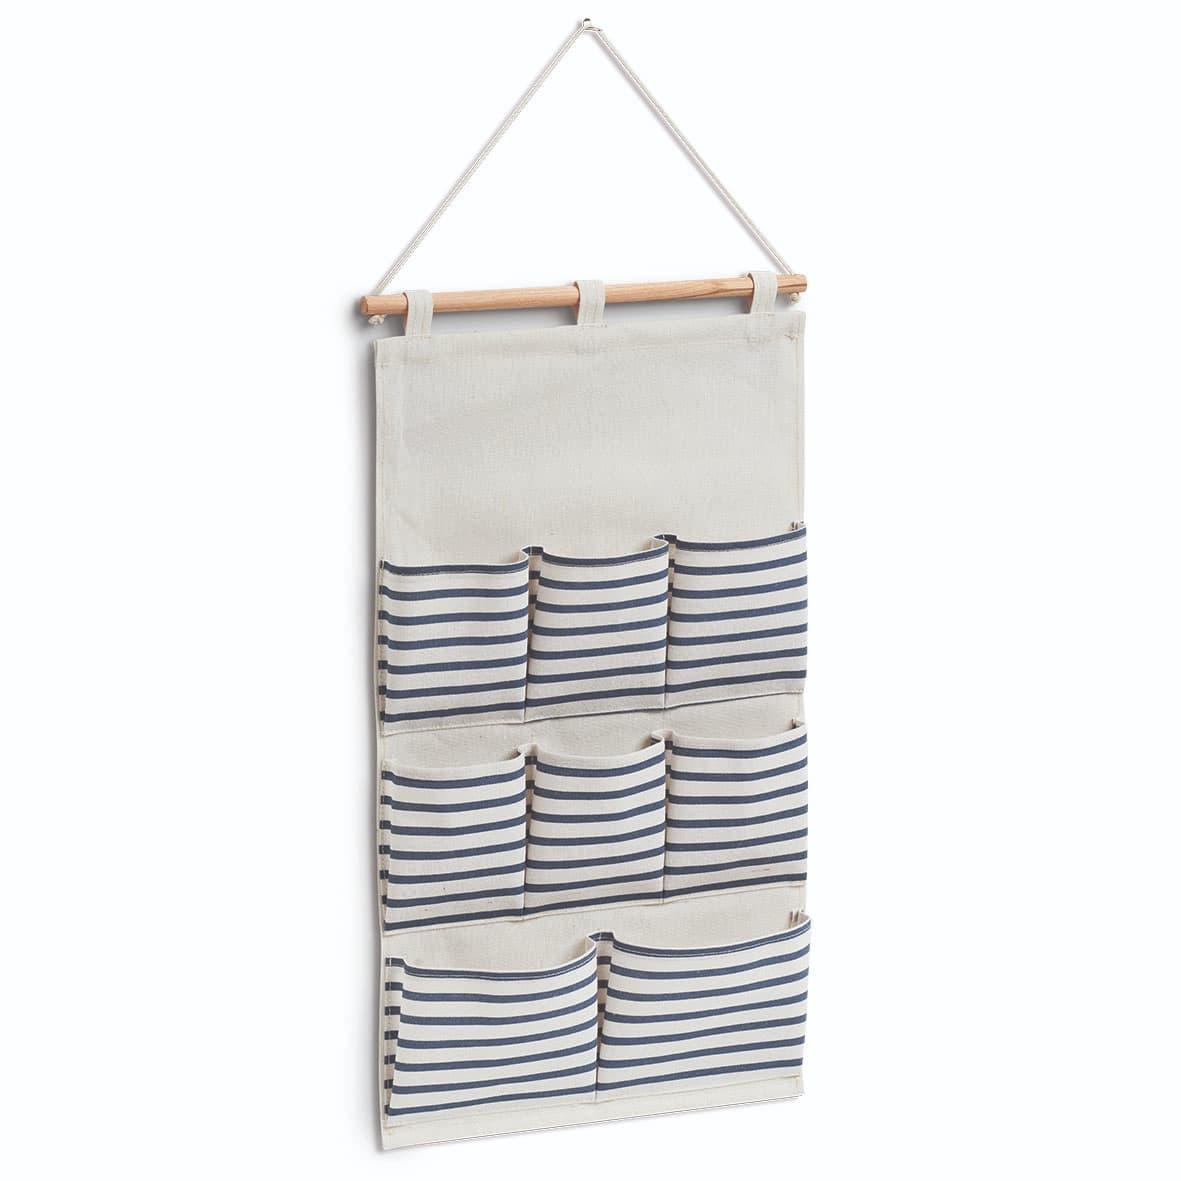 Organizator textil de perete cu 8 compartimente, Stripes Alb / Bleumarin, l35xH60 cm poza